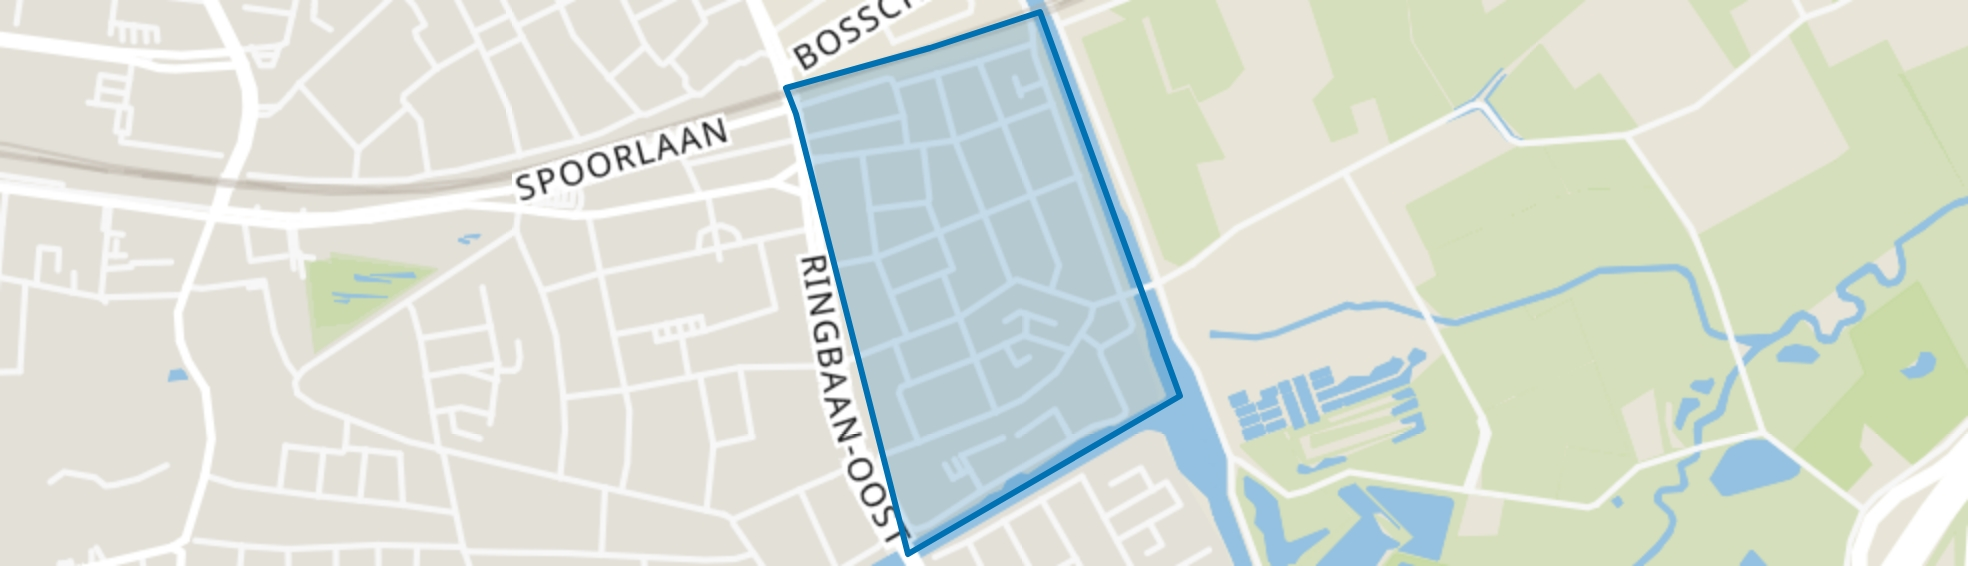 Armhoef, Tilburg map